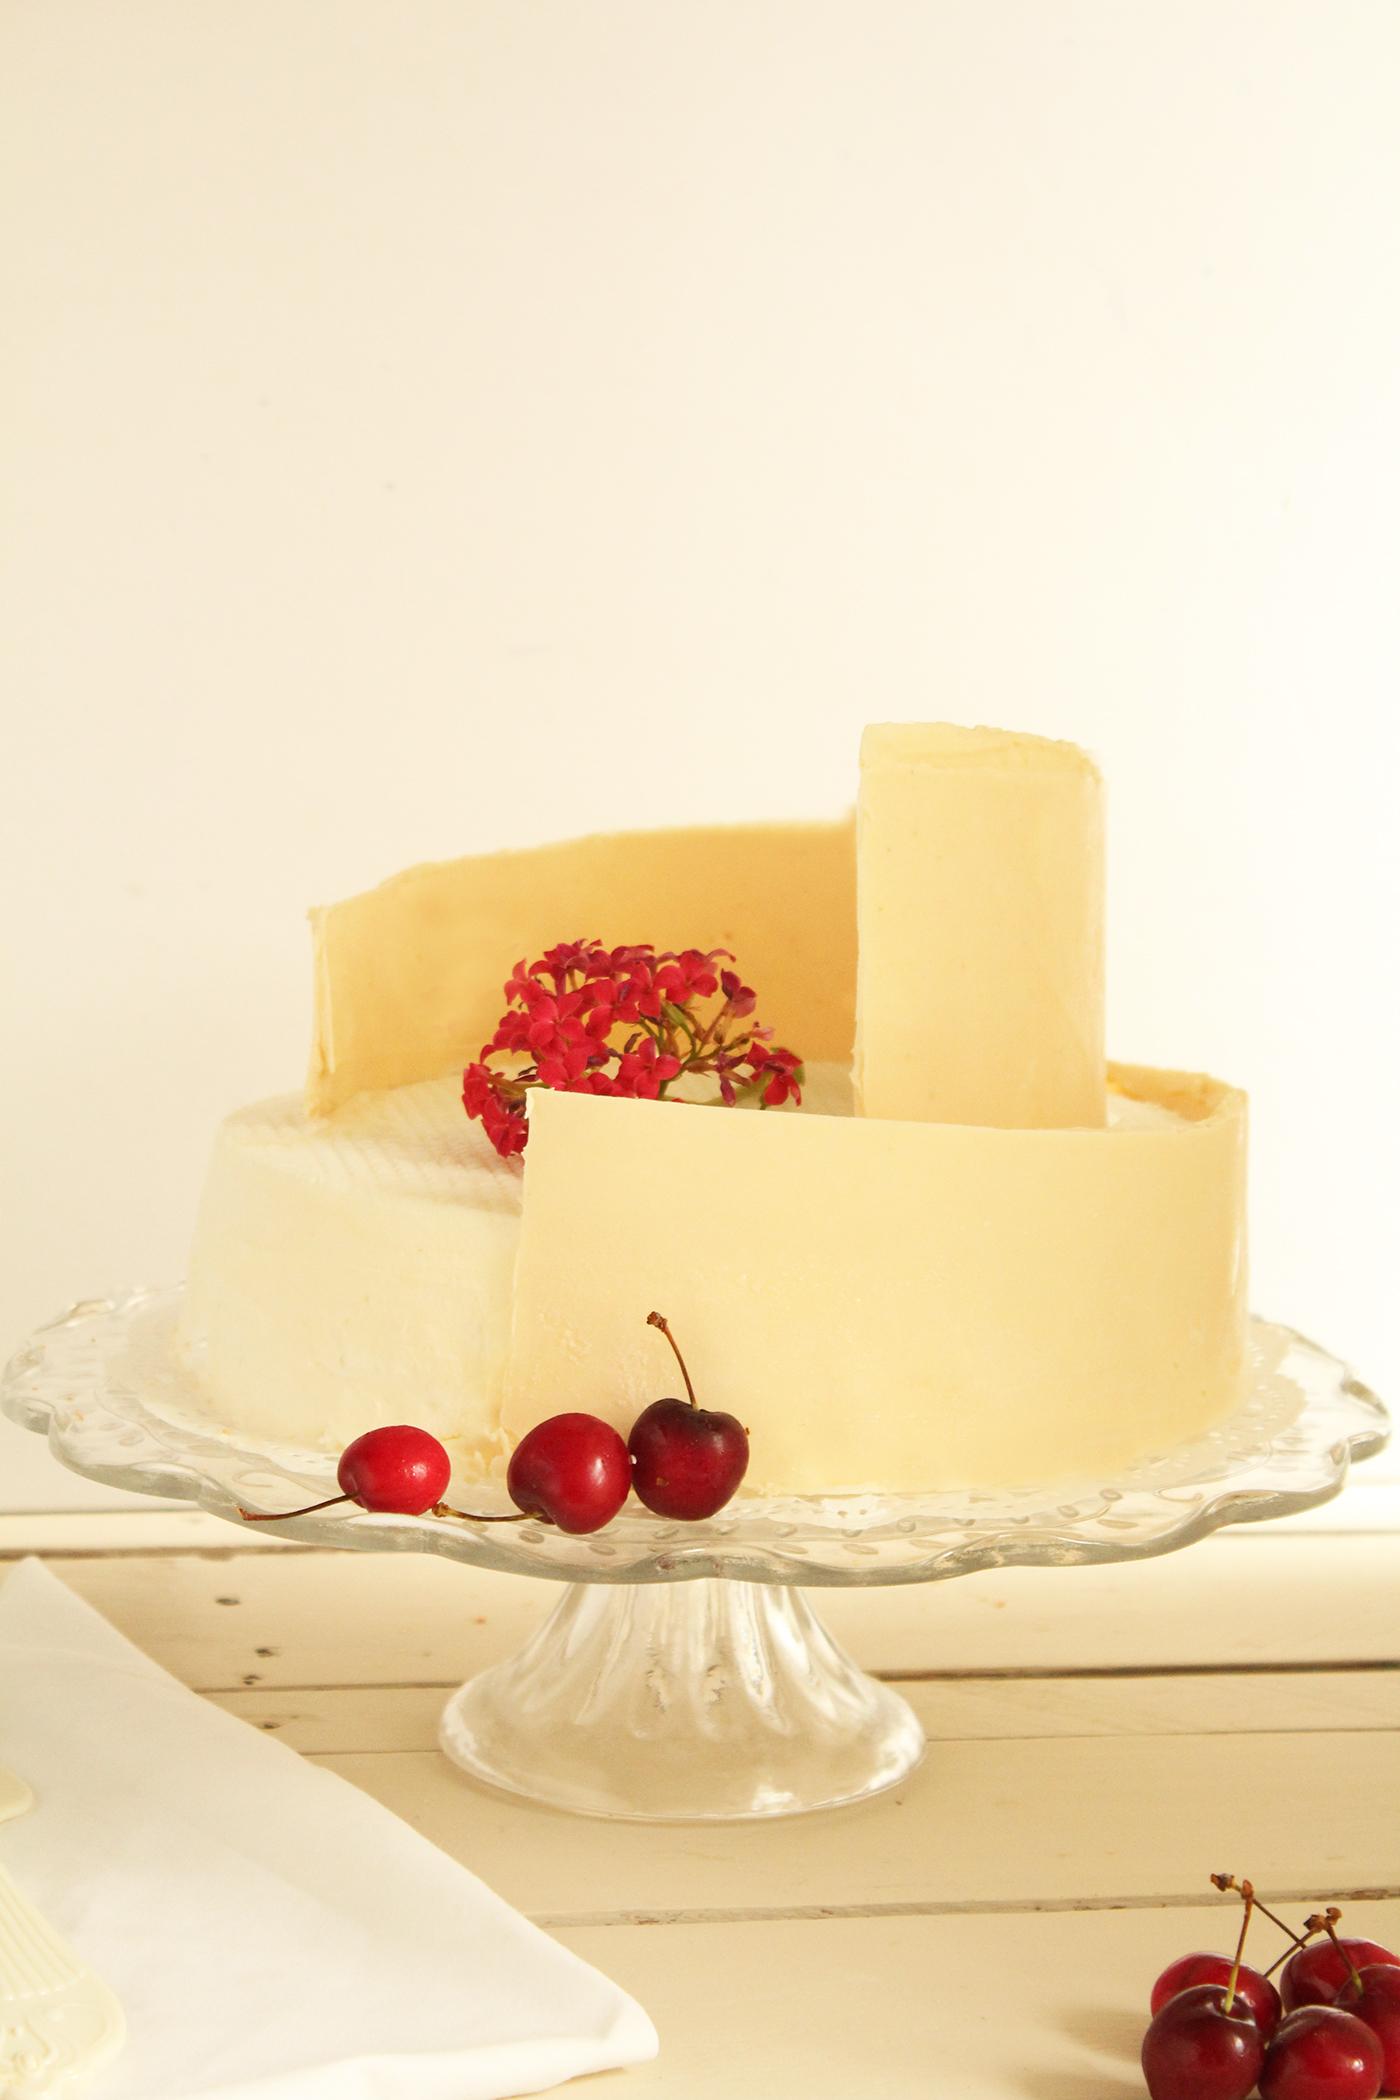 IMG 8442 - אותה גברת בשינוי אדרת :עוגת גבינה